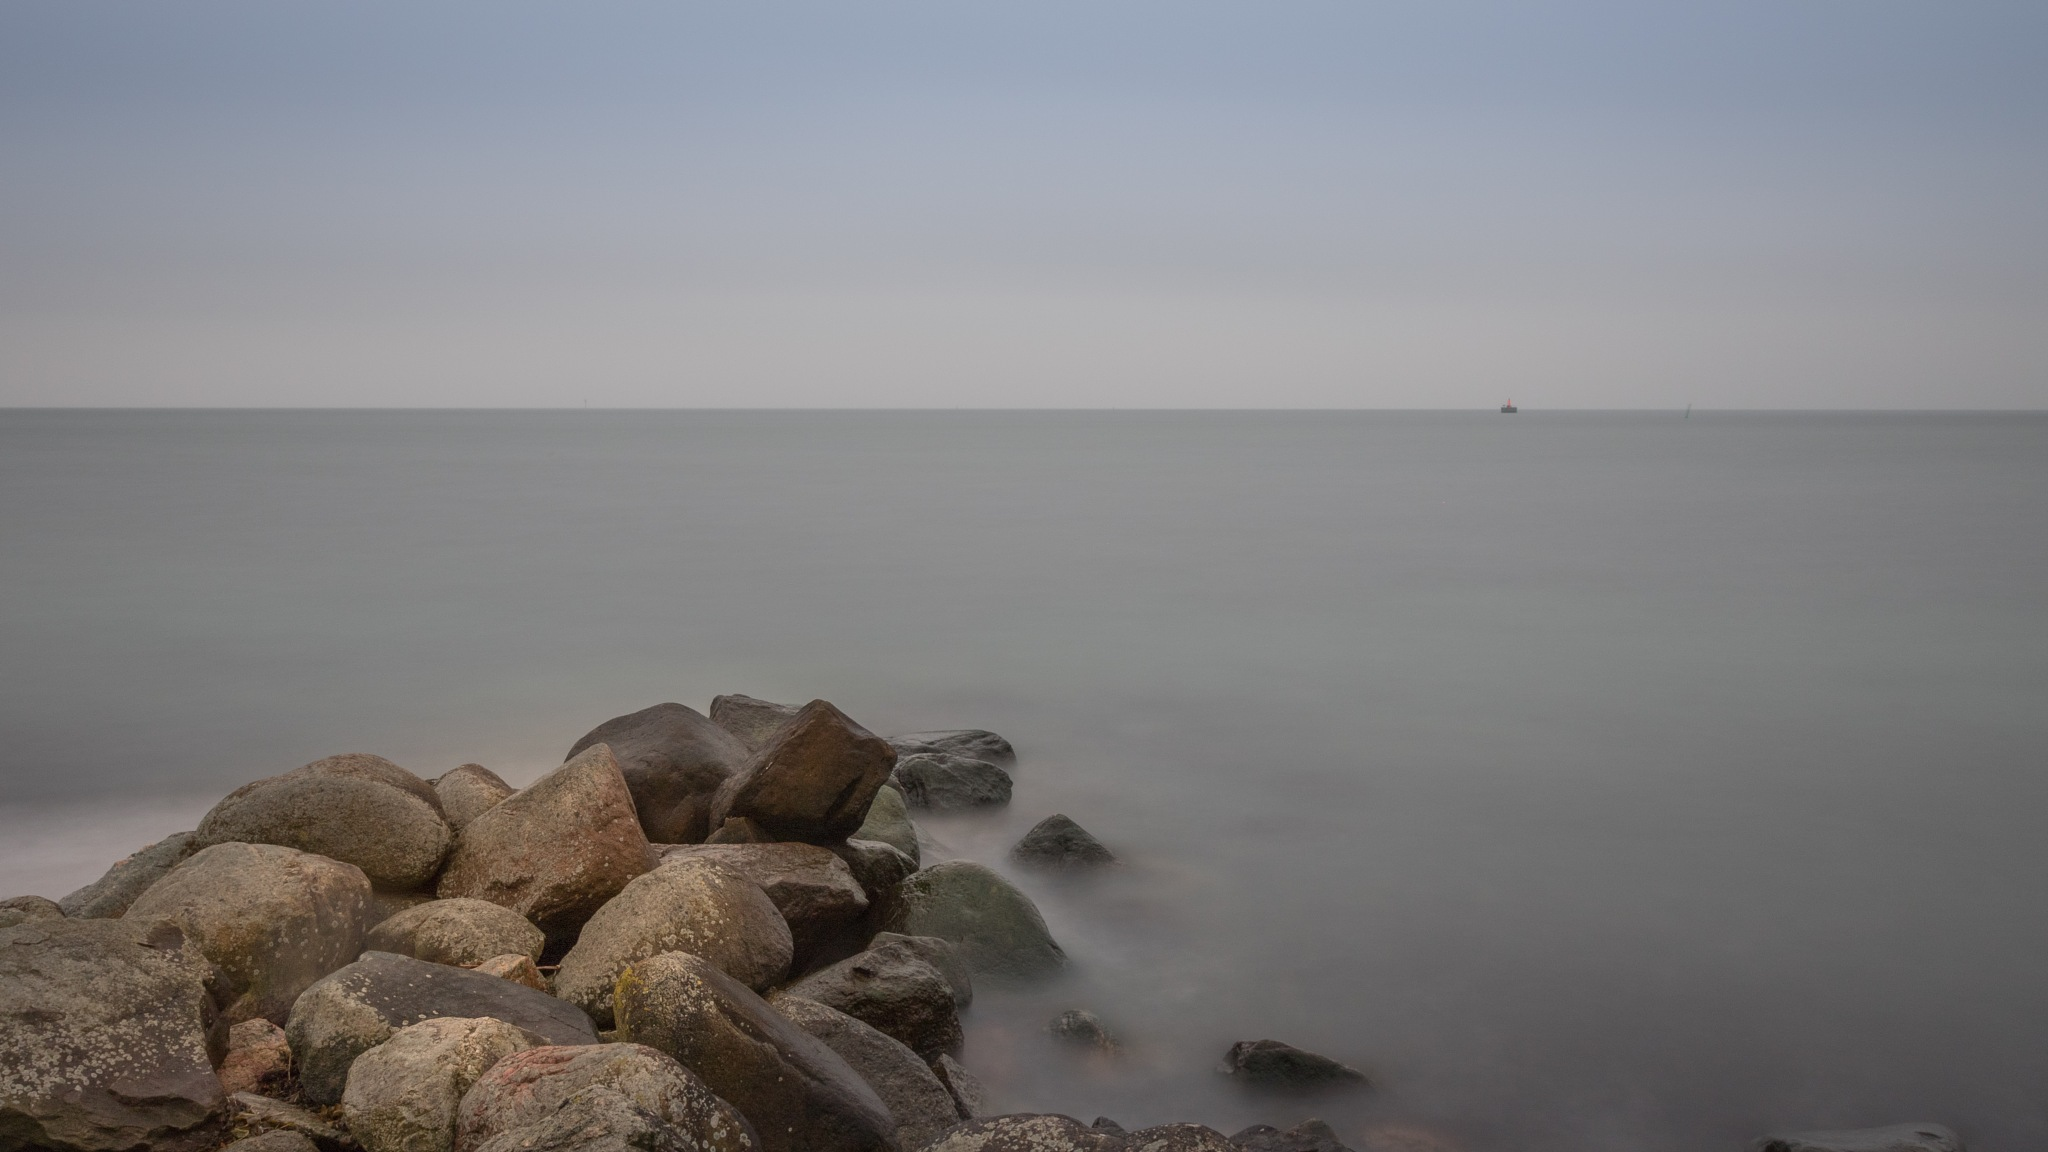 Baltic Sea by maybritt hansen